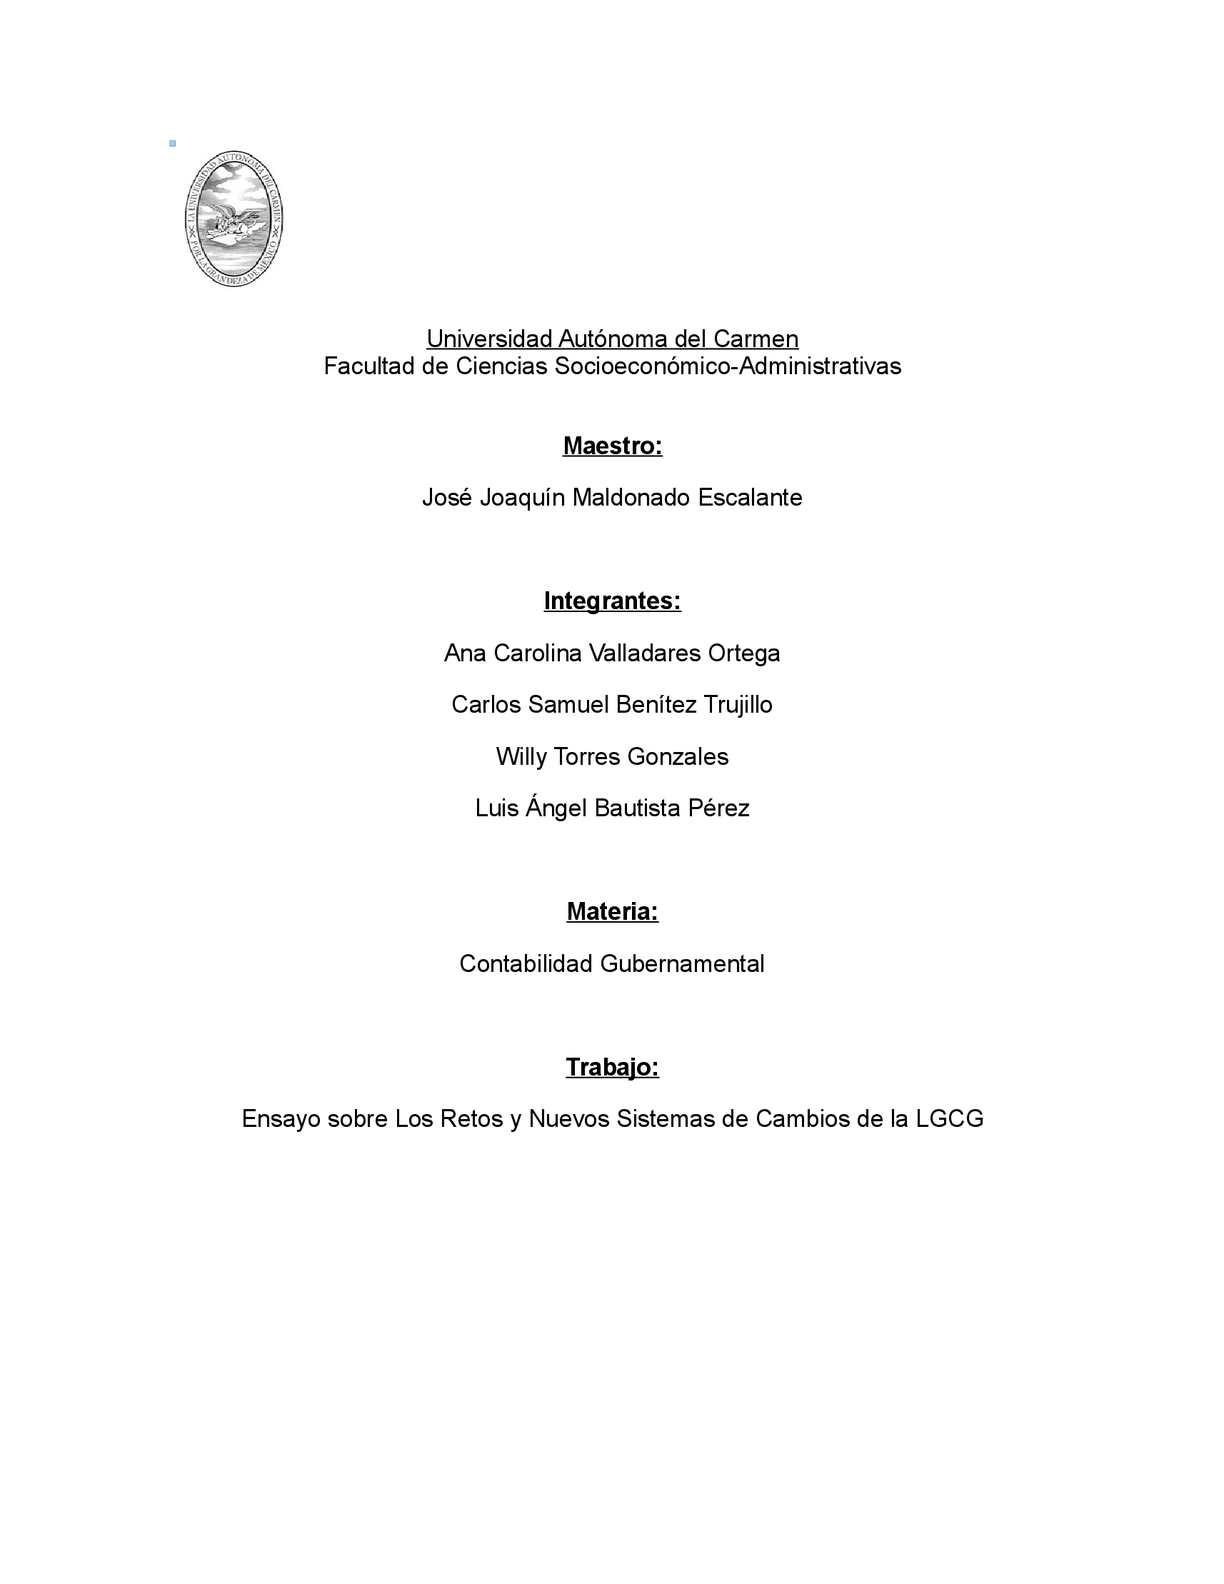 Calaméo - Ensayo de contabilidad gubernamental